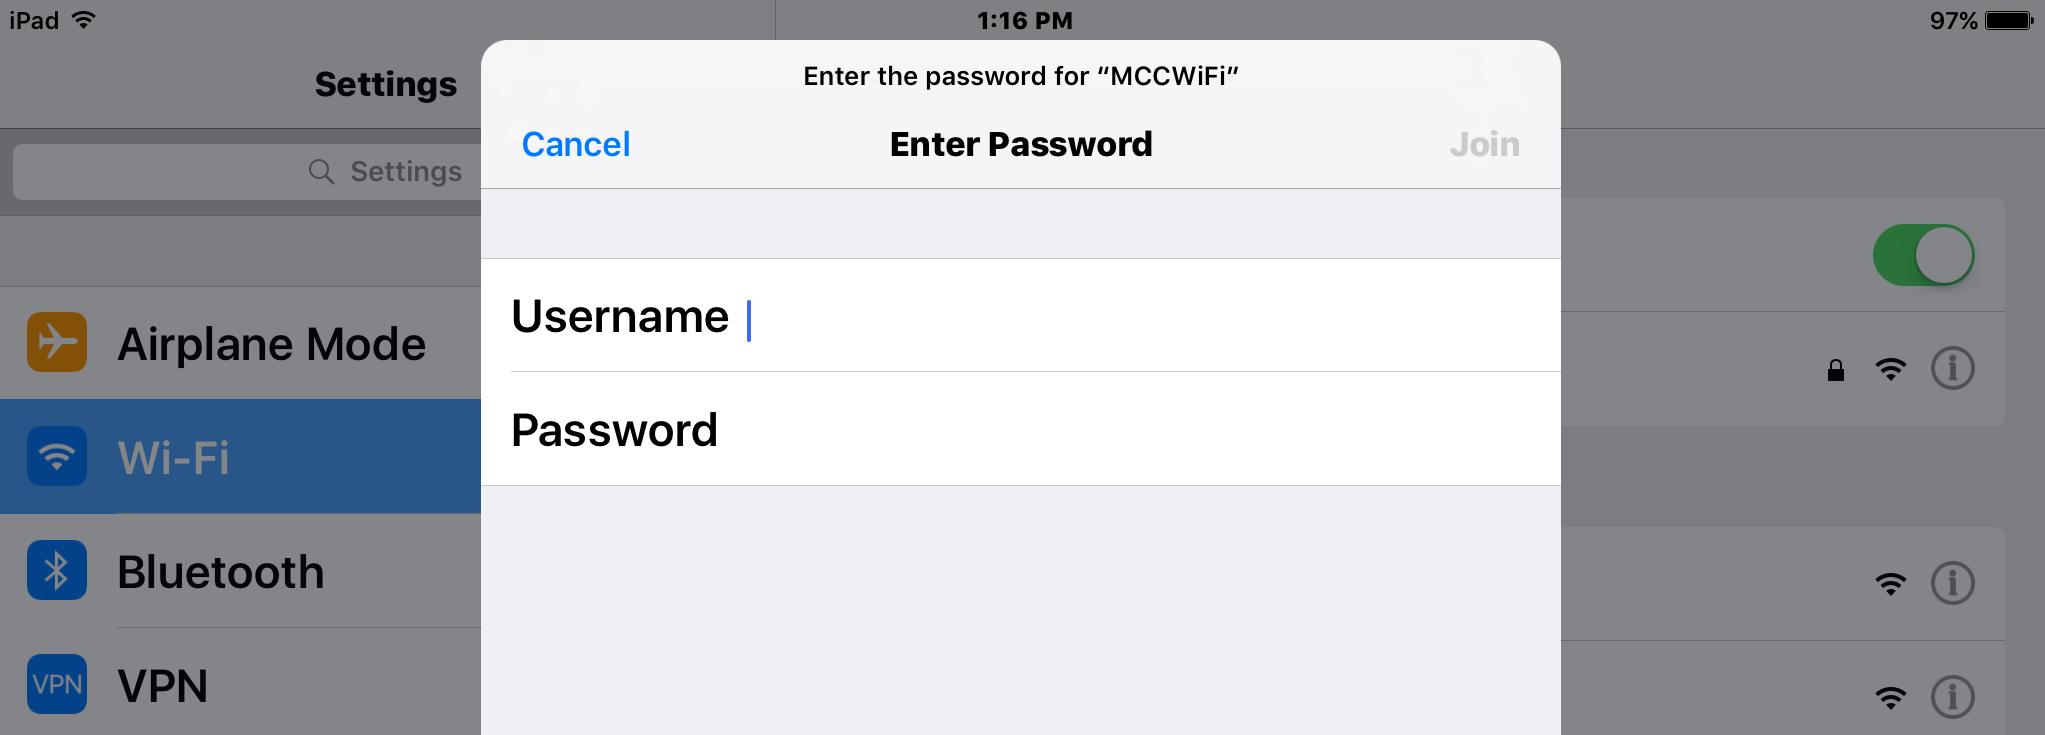 MCC WiFi secure login screen.